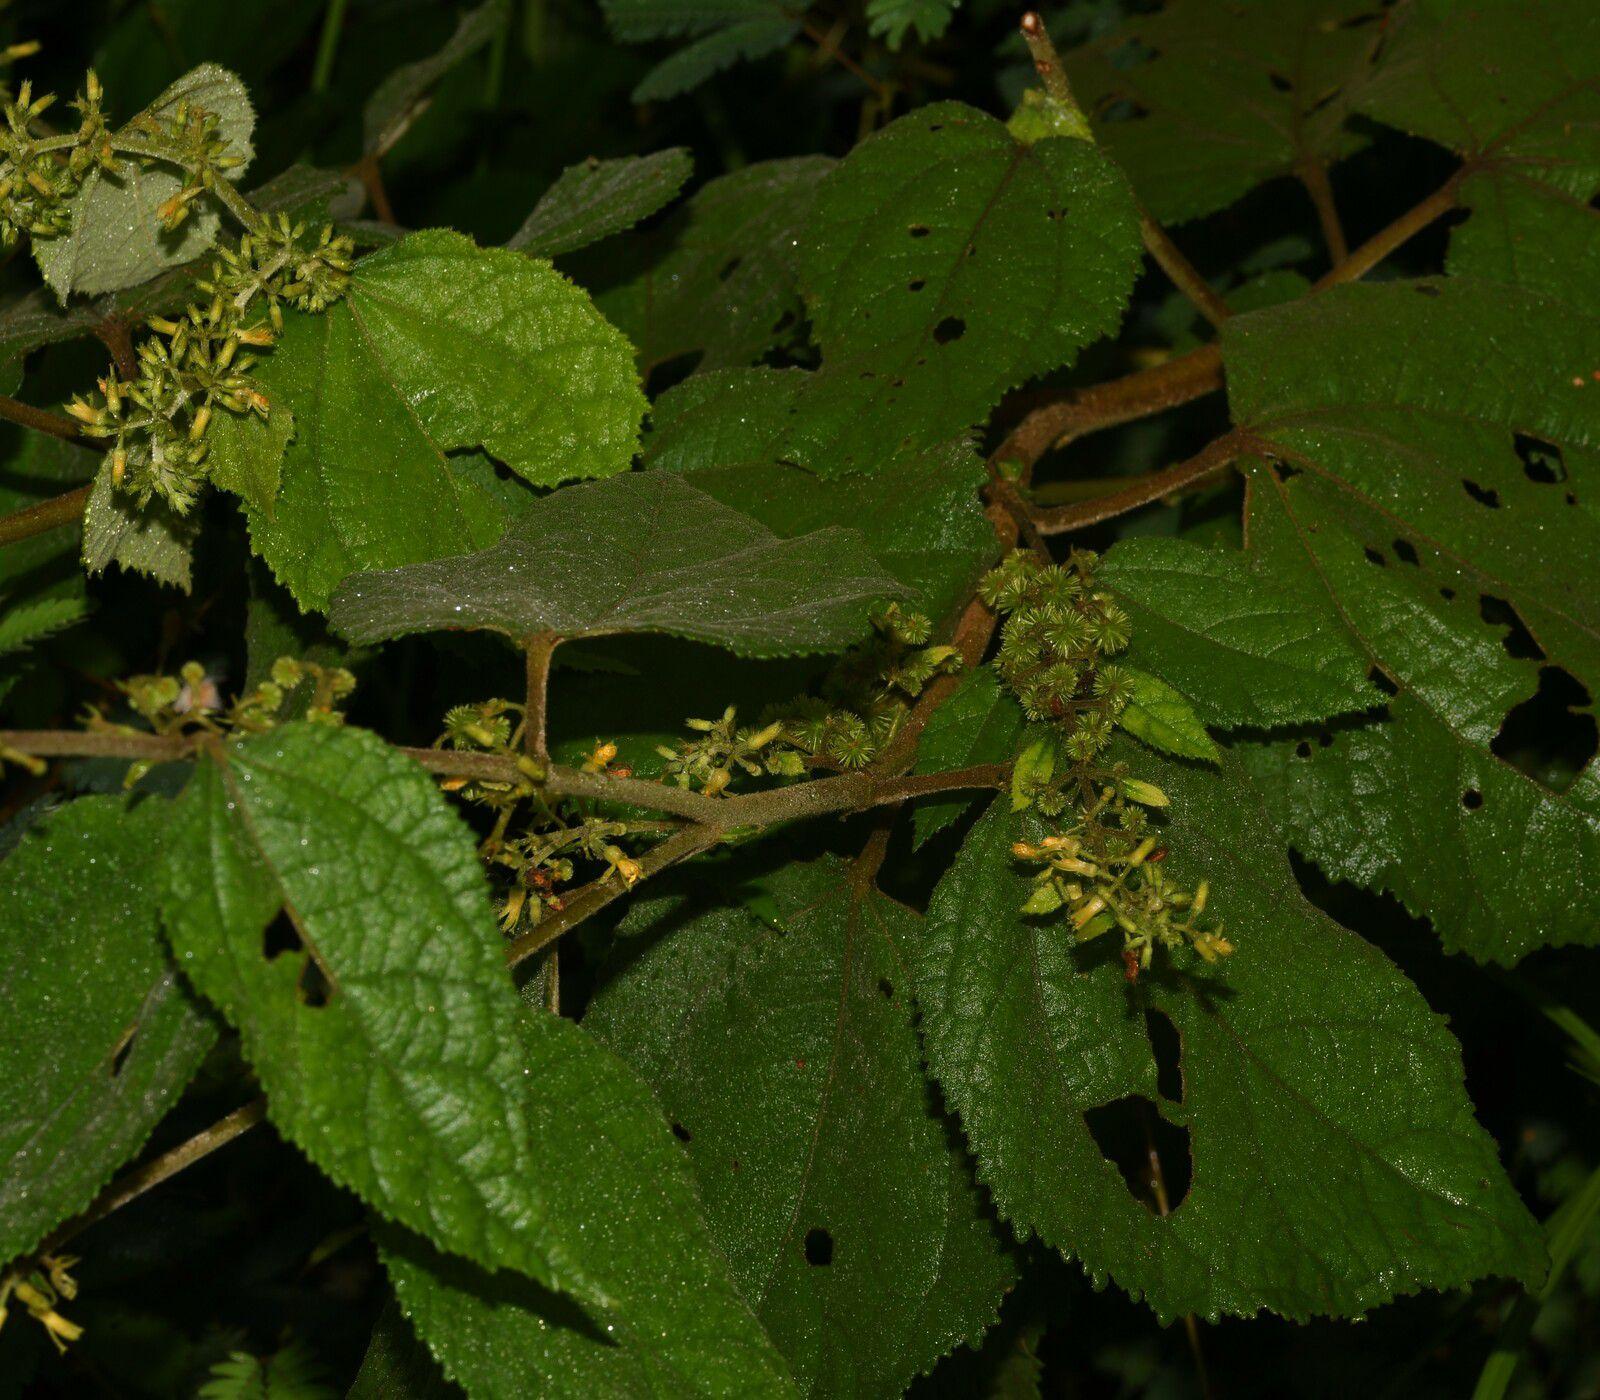 Triumfetta althaeoides